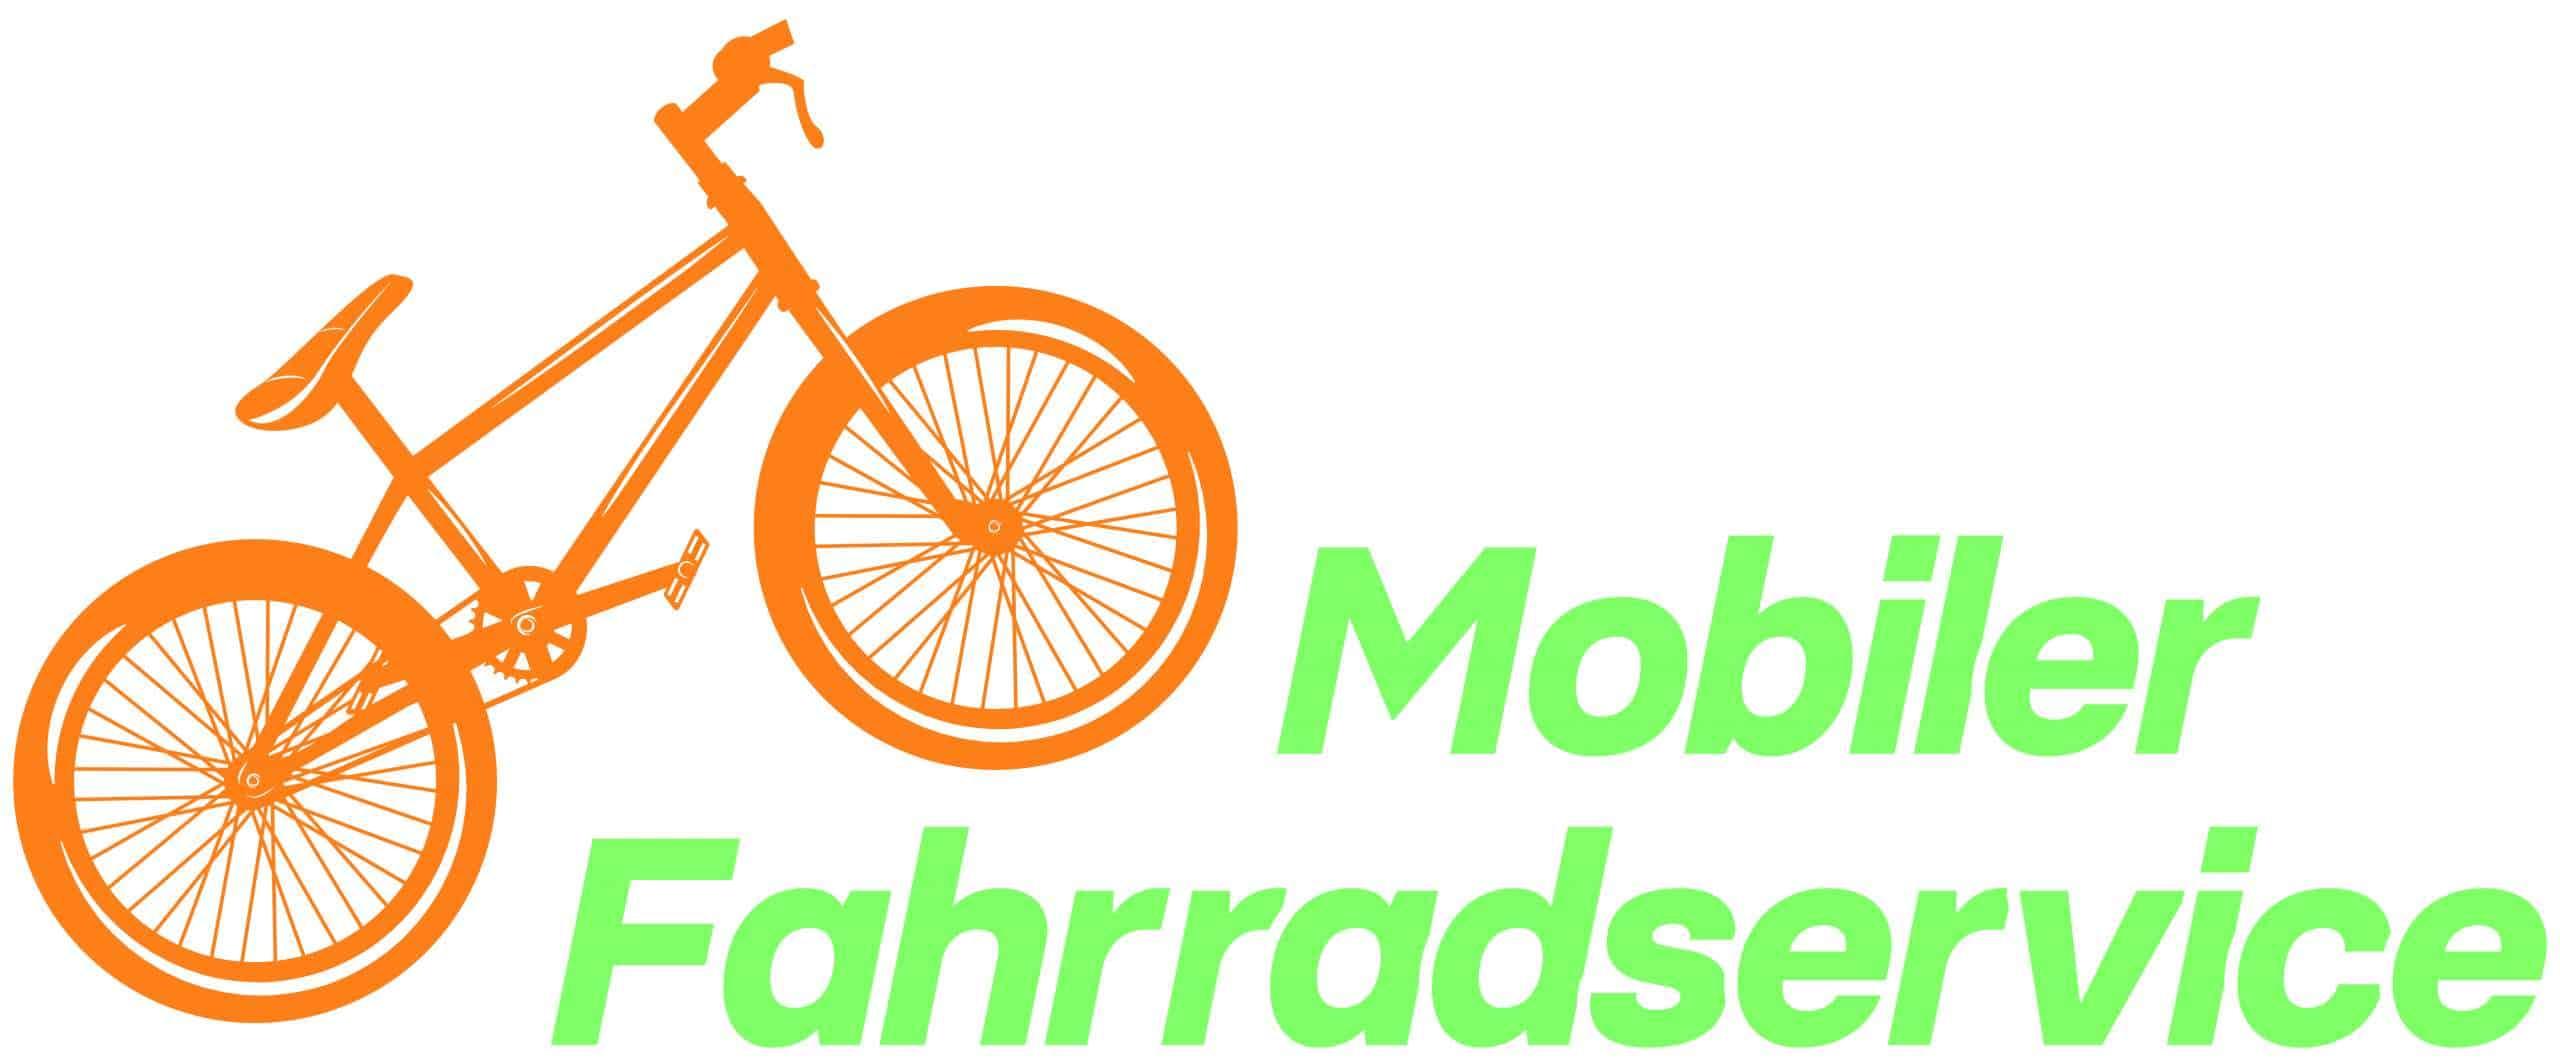 Mobiler Fahrradservice